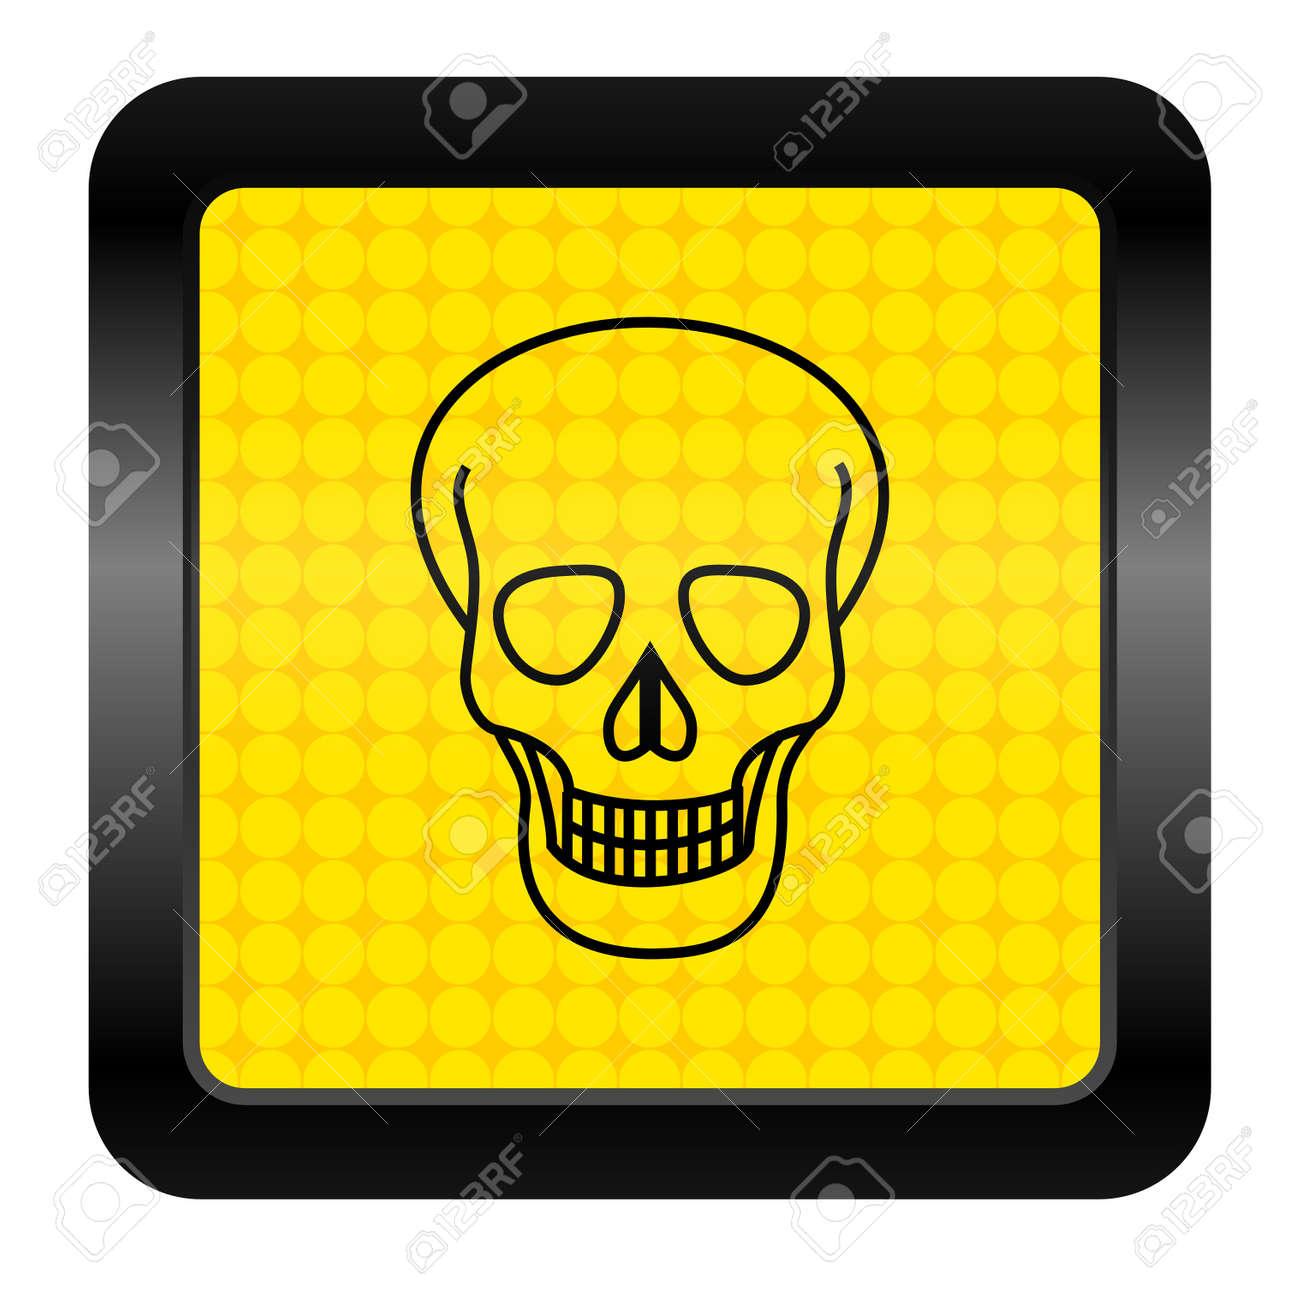 skull icon Stock Photo - 15926271